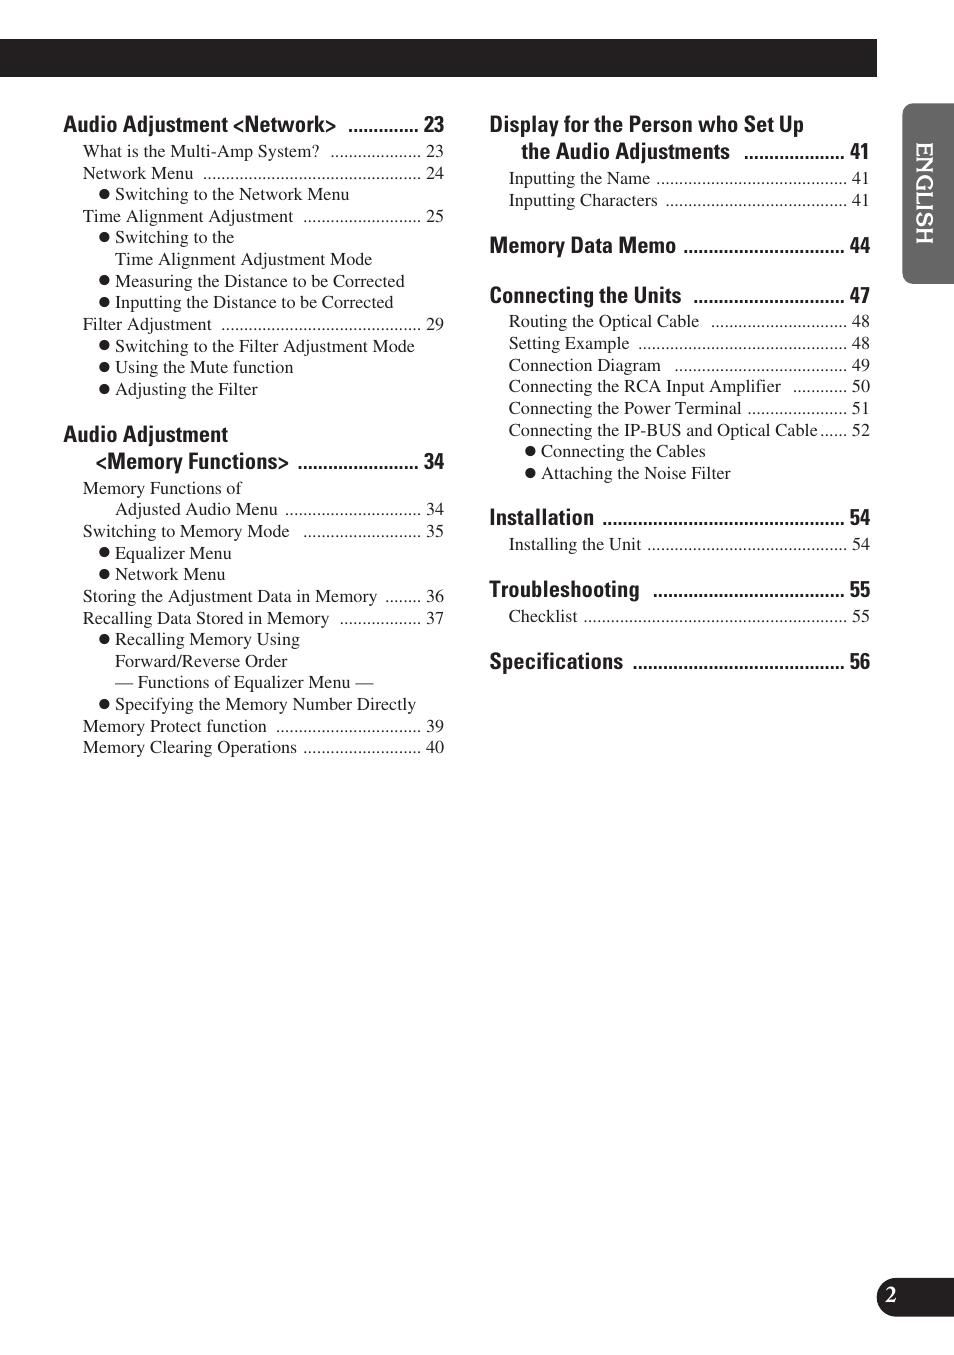 medium resolution of audio adjustment network installation troubleshooting pioneer deq p9 user manual page 3 60